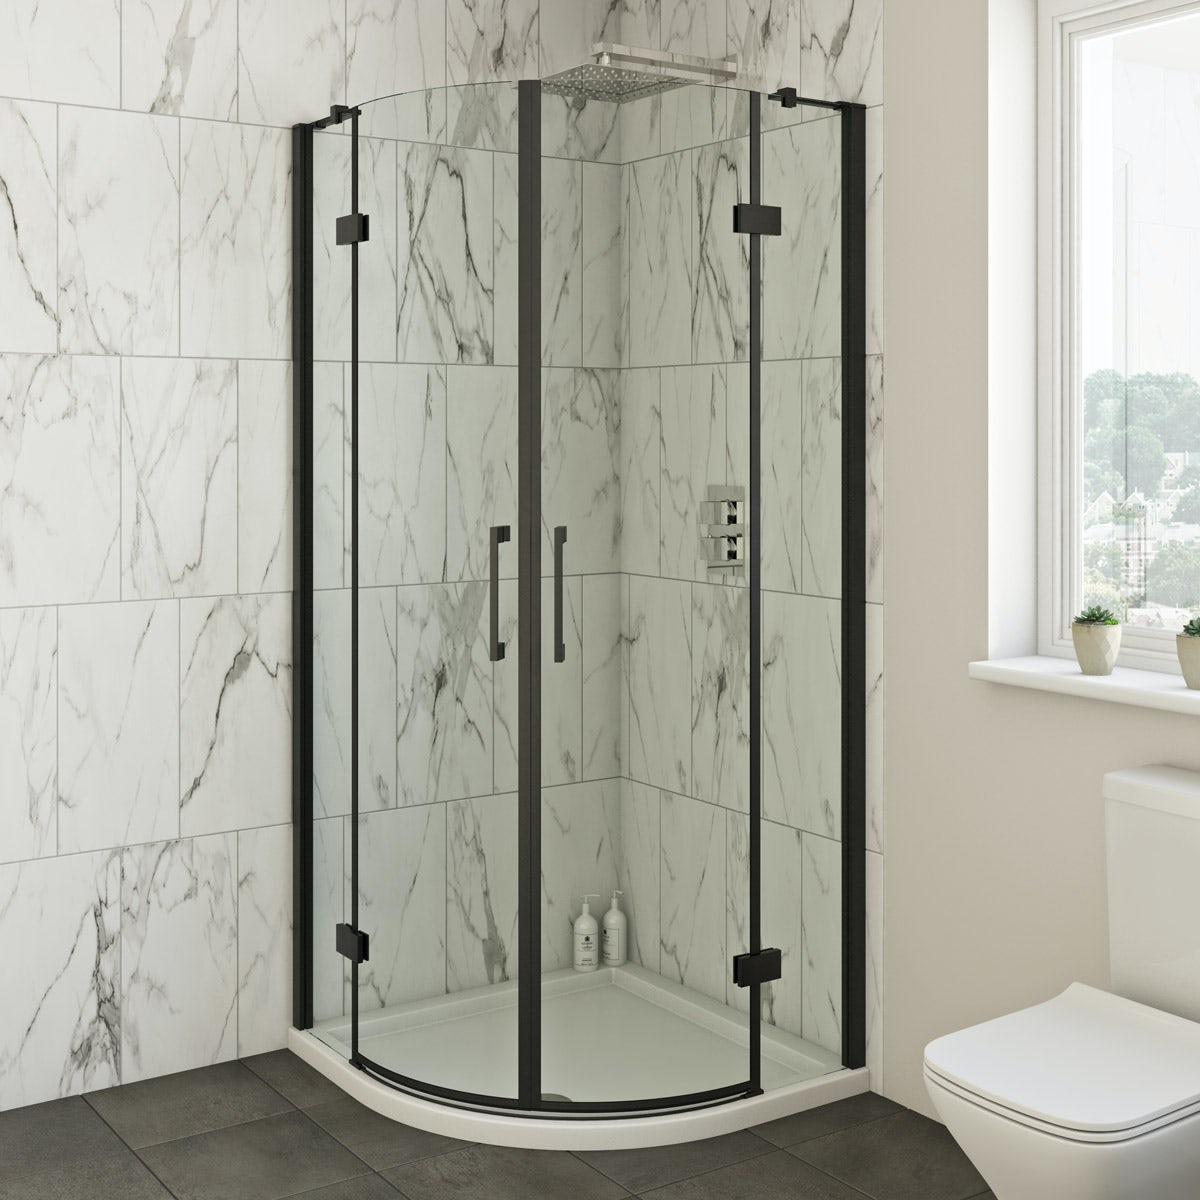 Fine Bathroom Showers Online Festooning - Bathtub Design Ideas ...